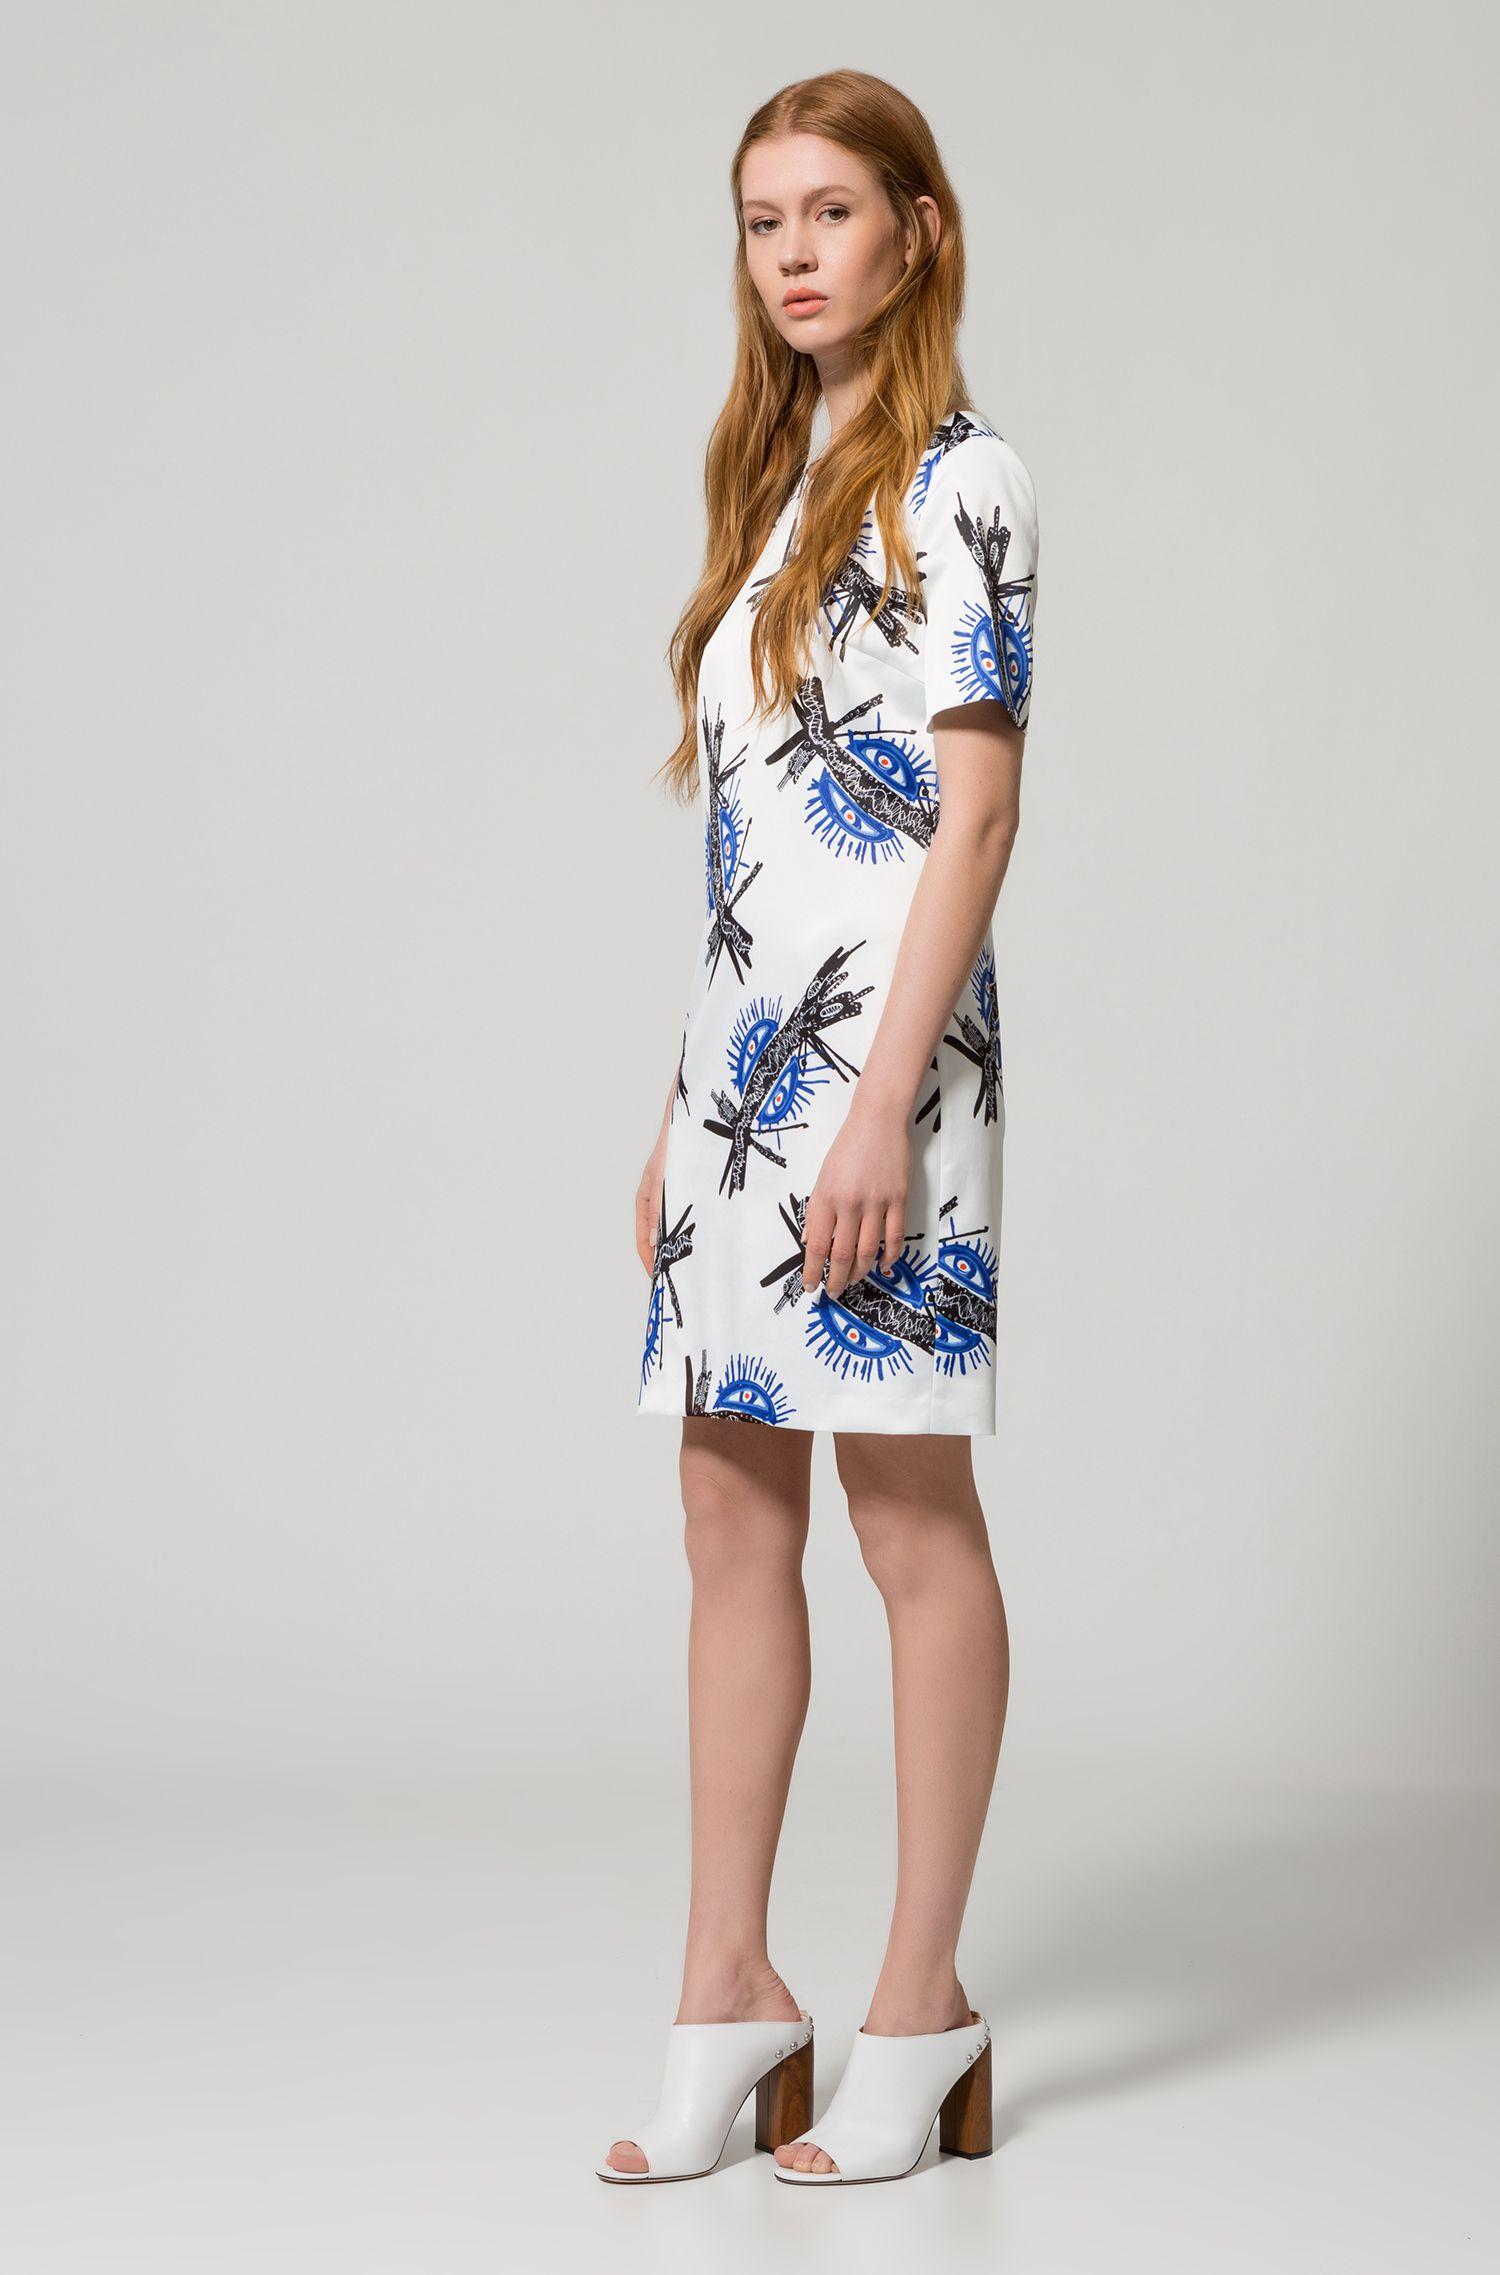 Printed Dress | Kones